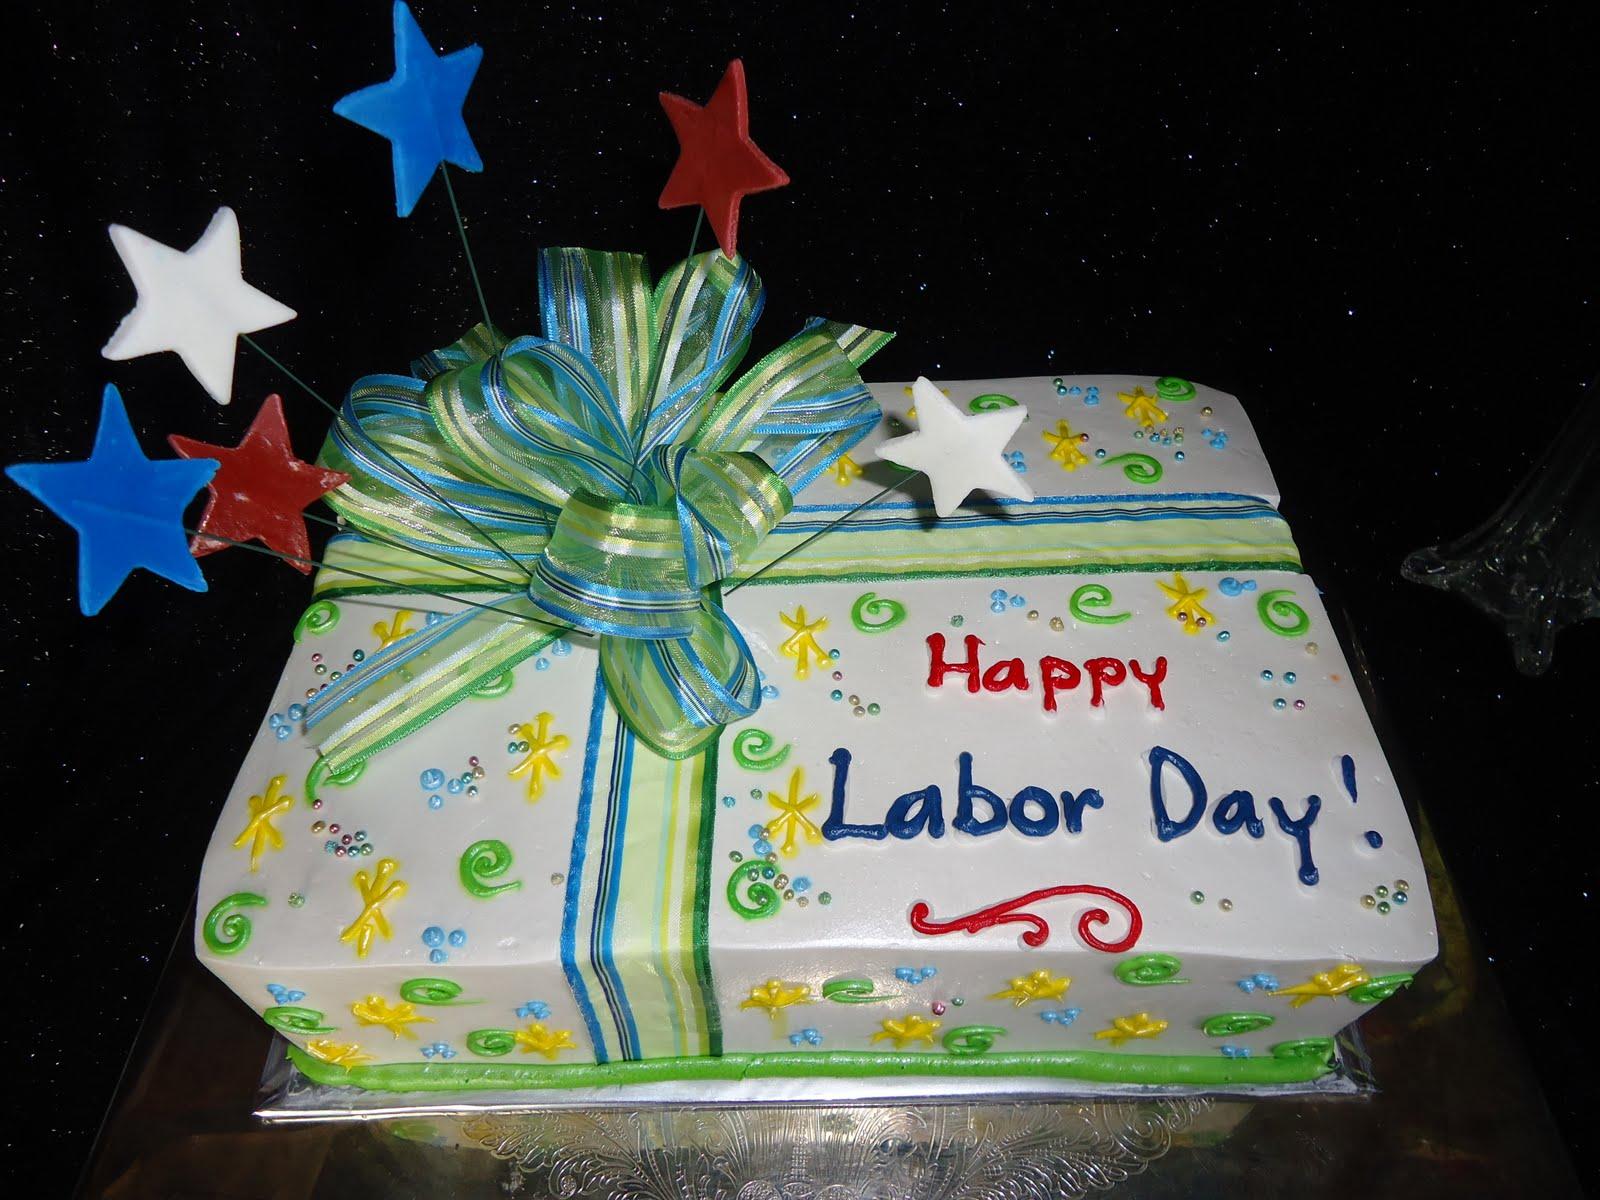 Bamboo Bakery 602 246 8061 Labor Day Cake For Celebration